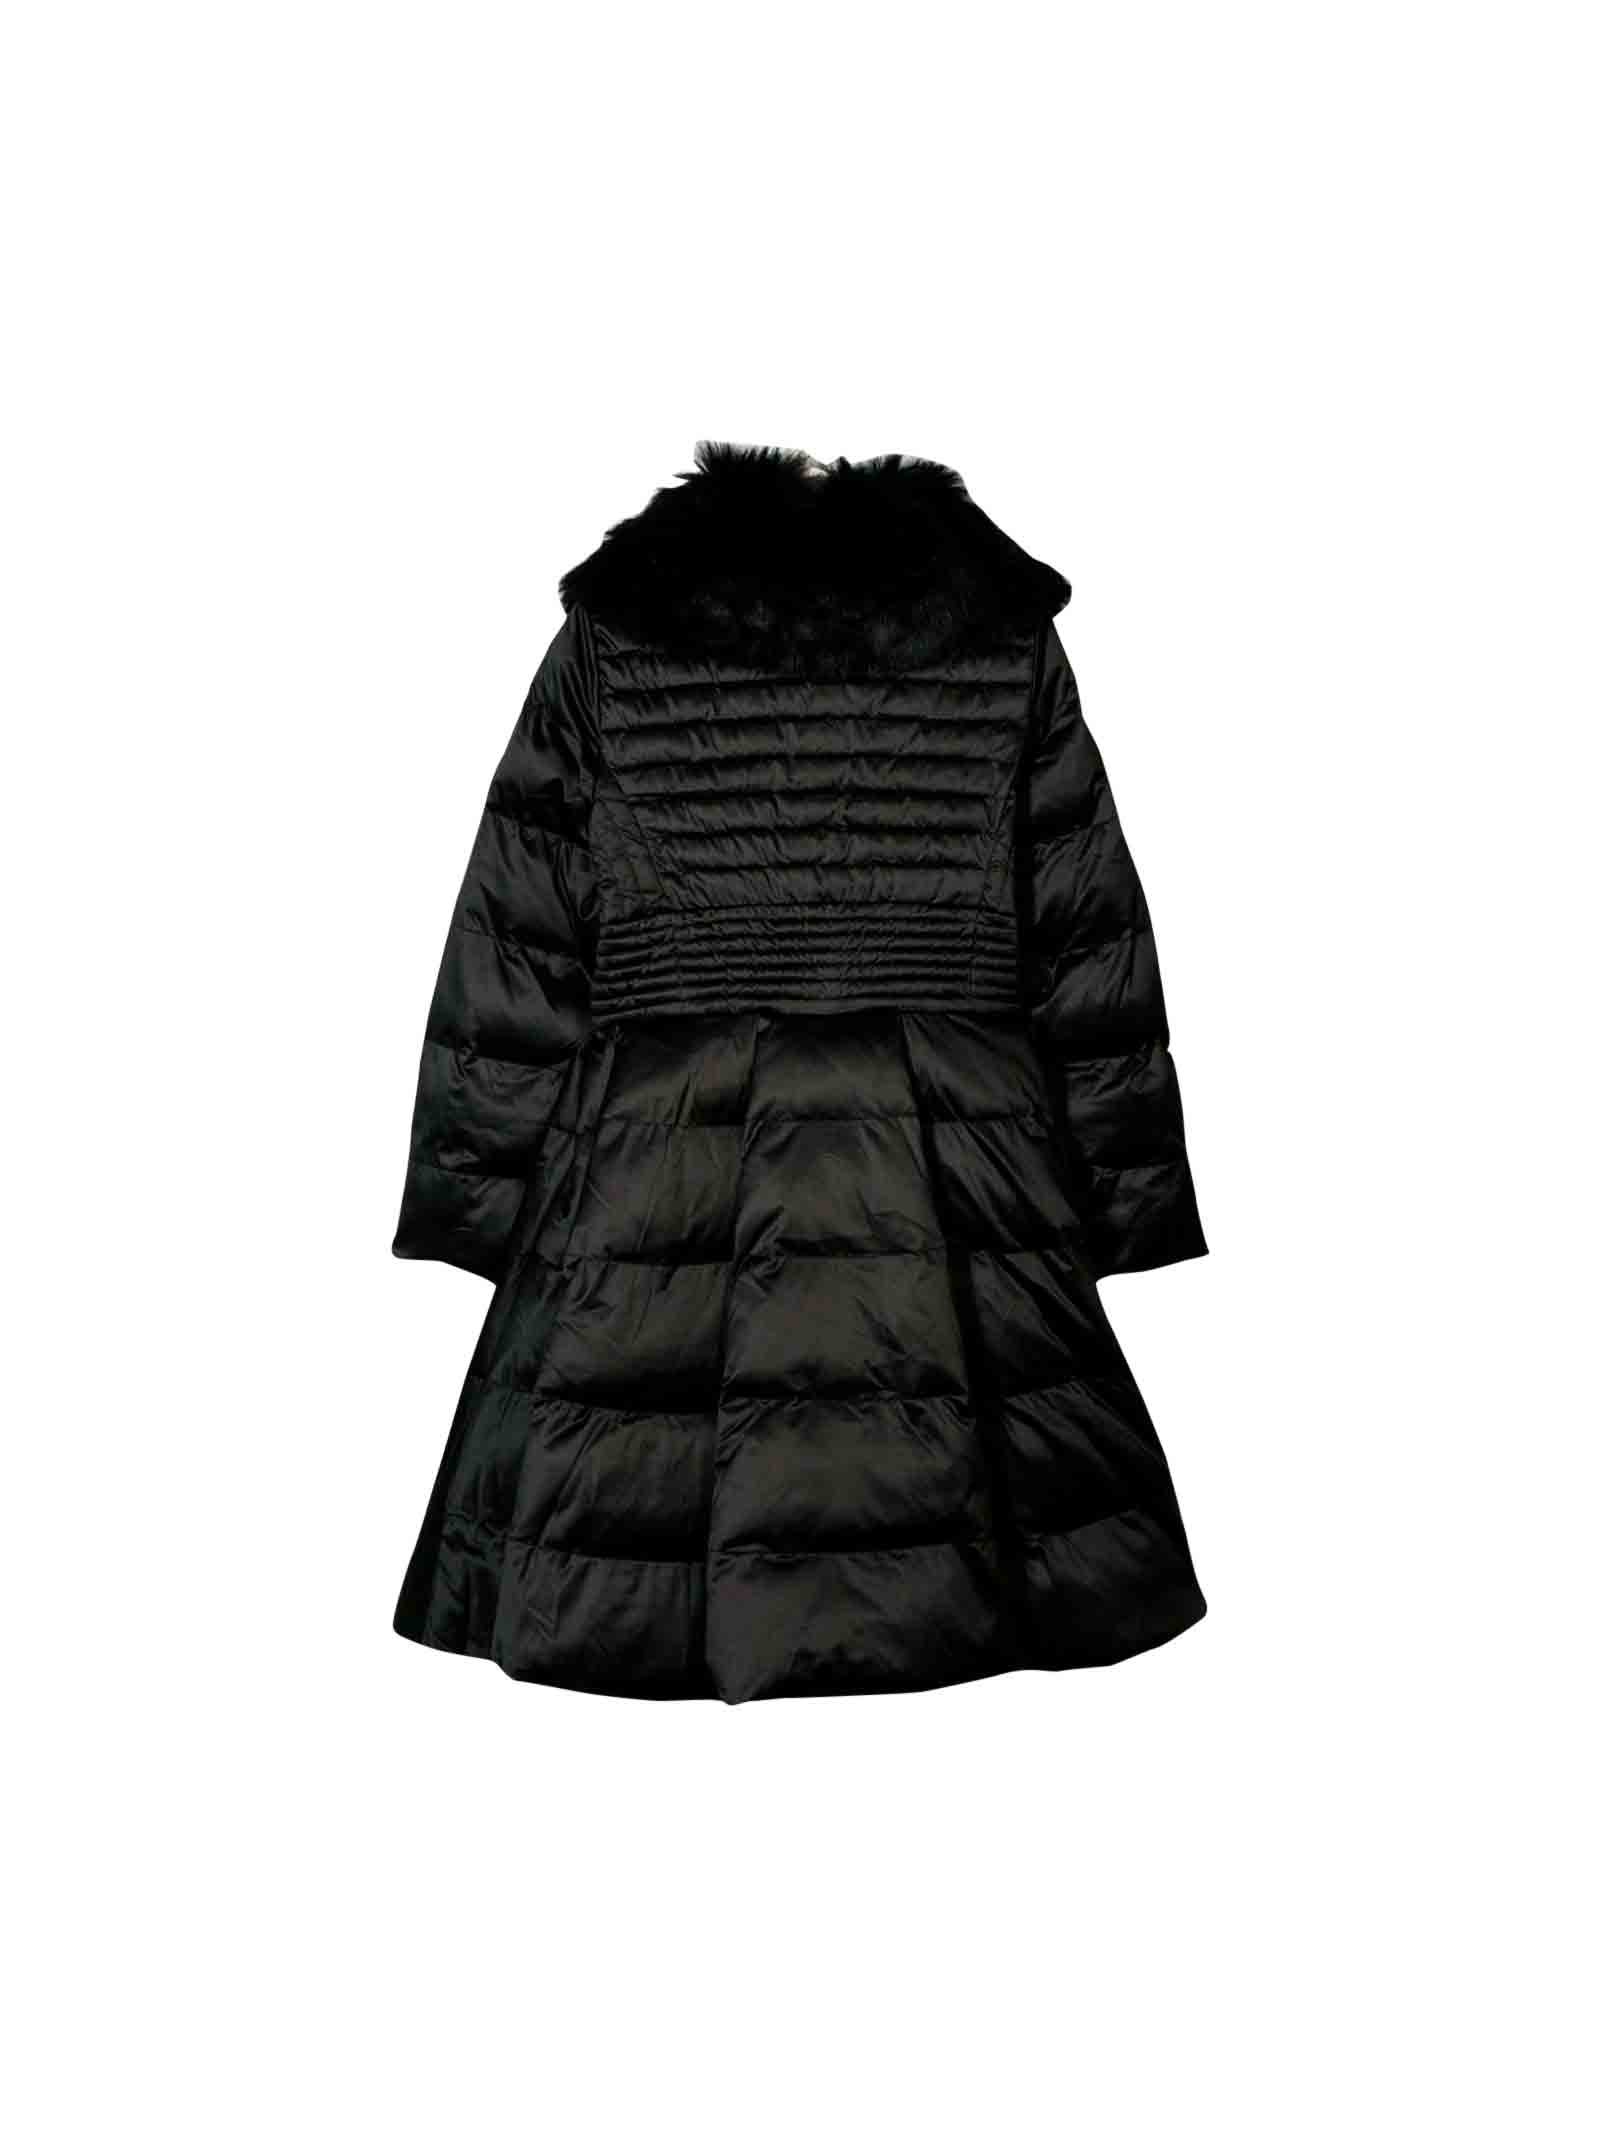 low priced 3498b 757dc Piumino nero Elisabetta Franchi la mia bambina